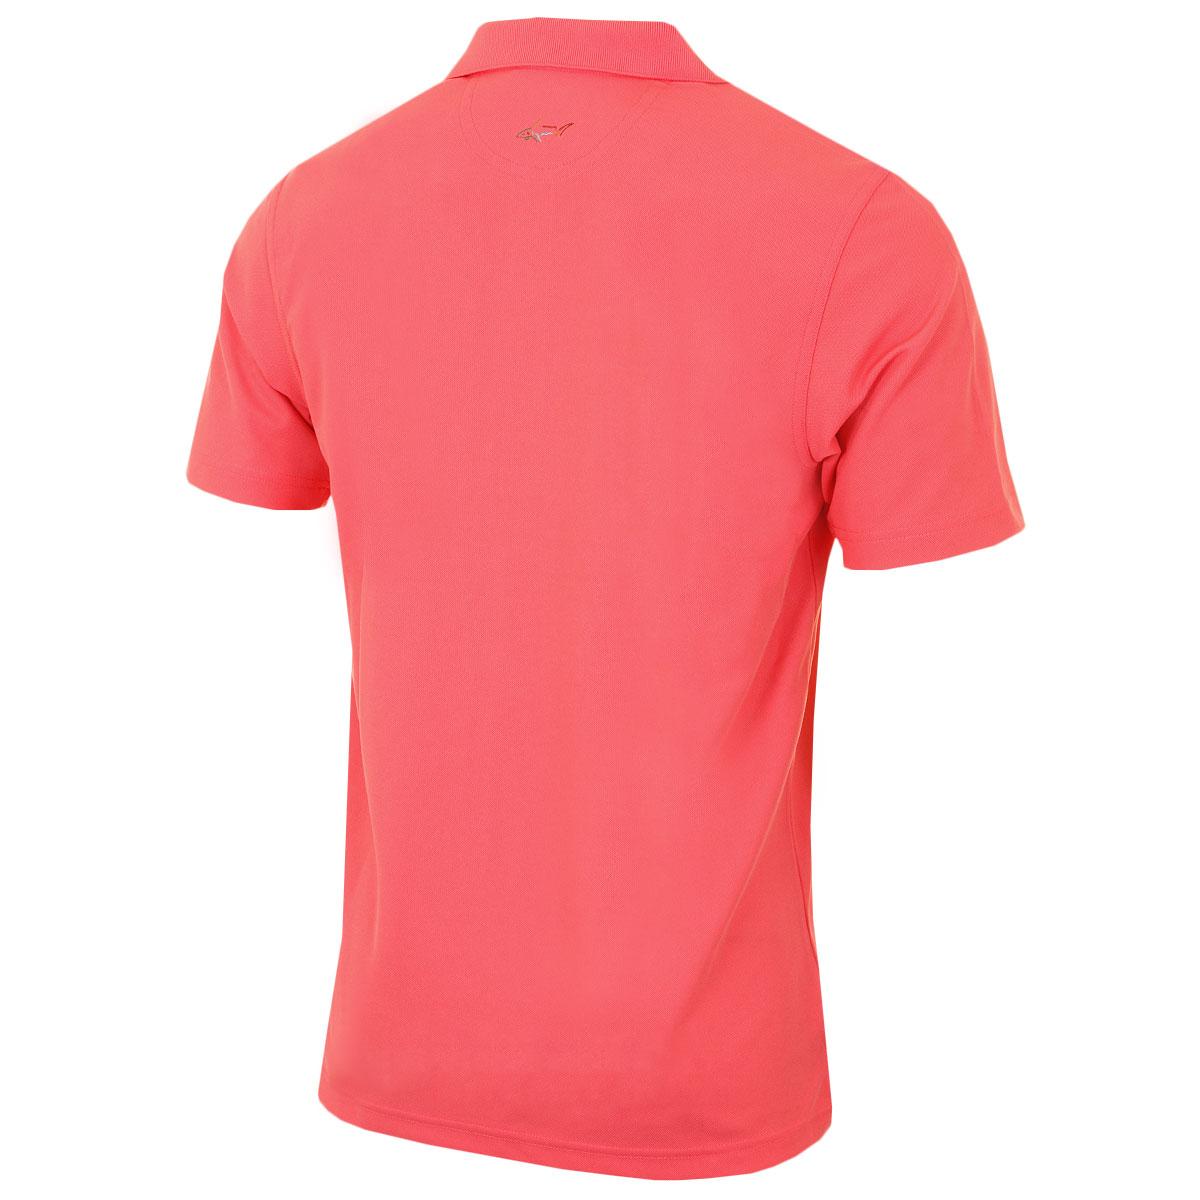 Greg-Norman-Mens-KX04-Performance-Micro-Pique-Golf-Polo-Shirt-28-OFF-RRP thumbnail 16